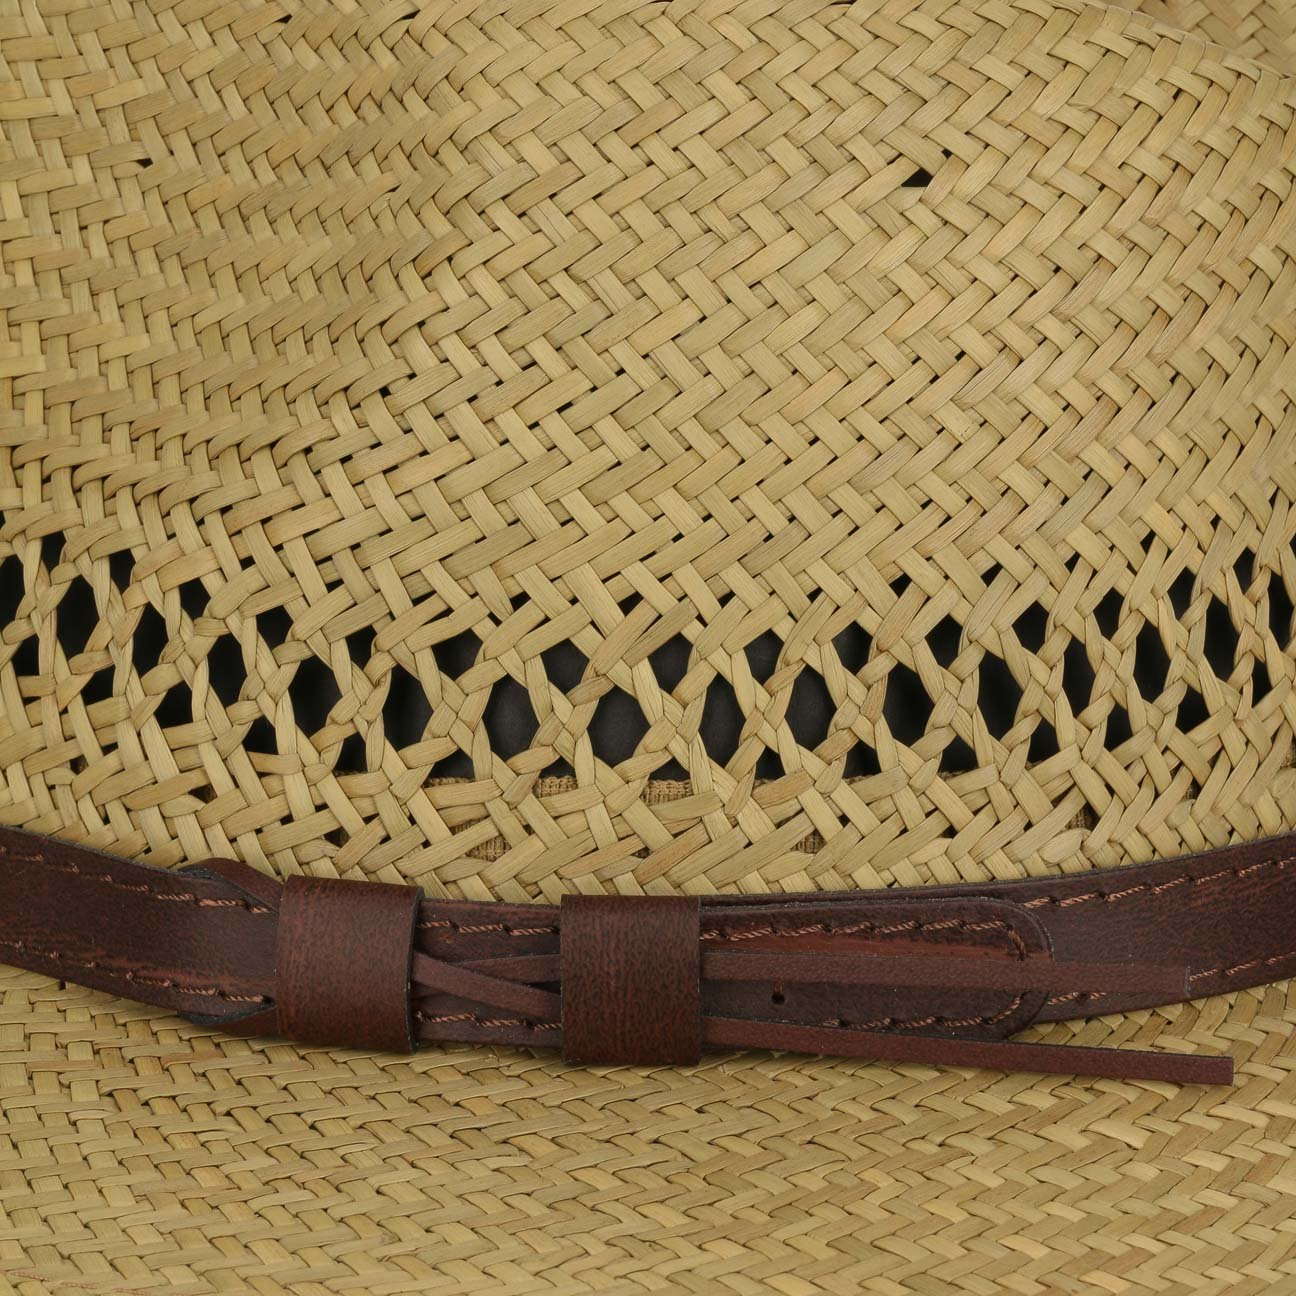 Made in Italy Travellerhut Fr/ühling-Sommer Lipodo Classic Traveller Strohhut mit Lederband Sonnenhut Sommerhut Hut Strandhut Herrenhut Damenhut Damen//Herren